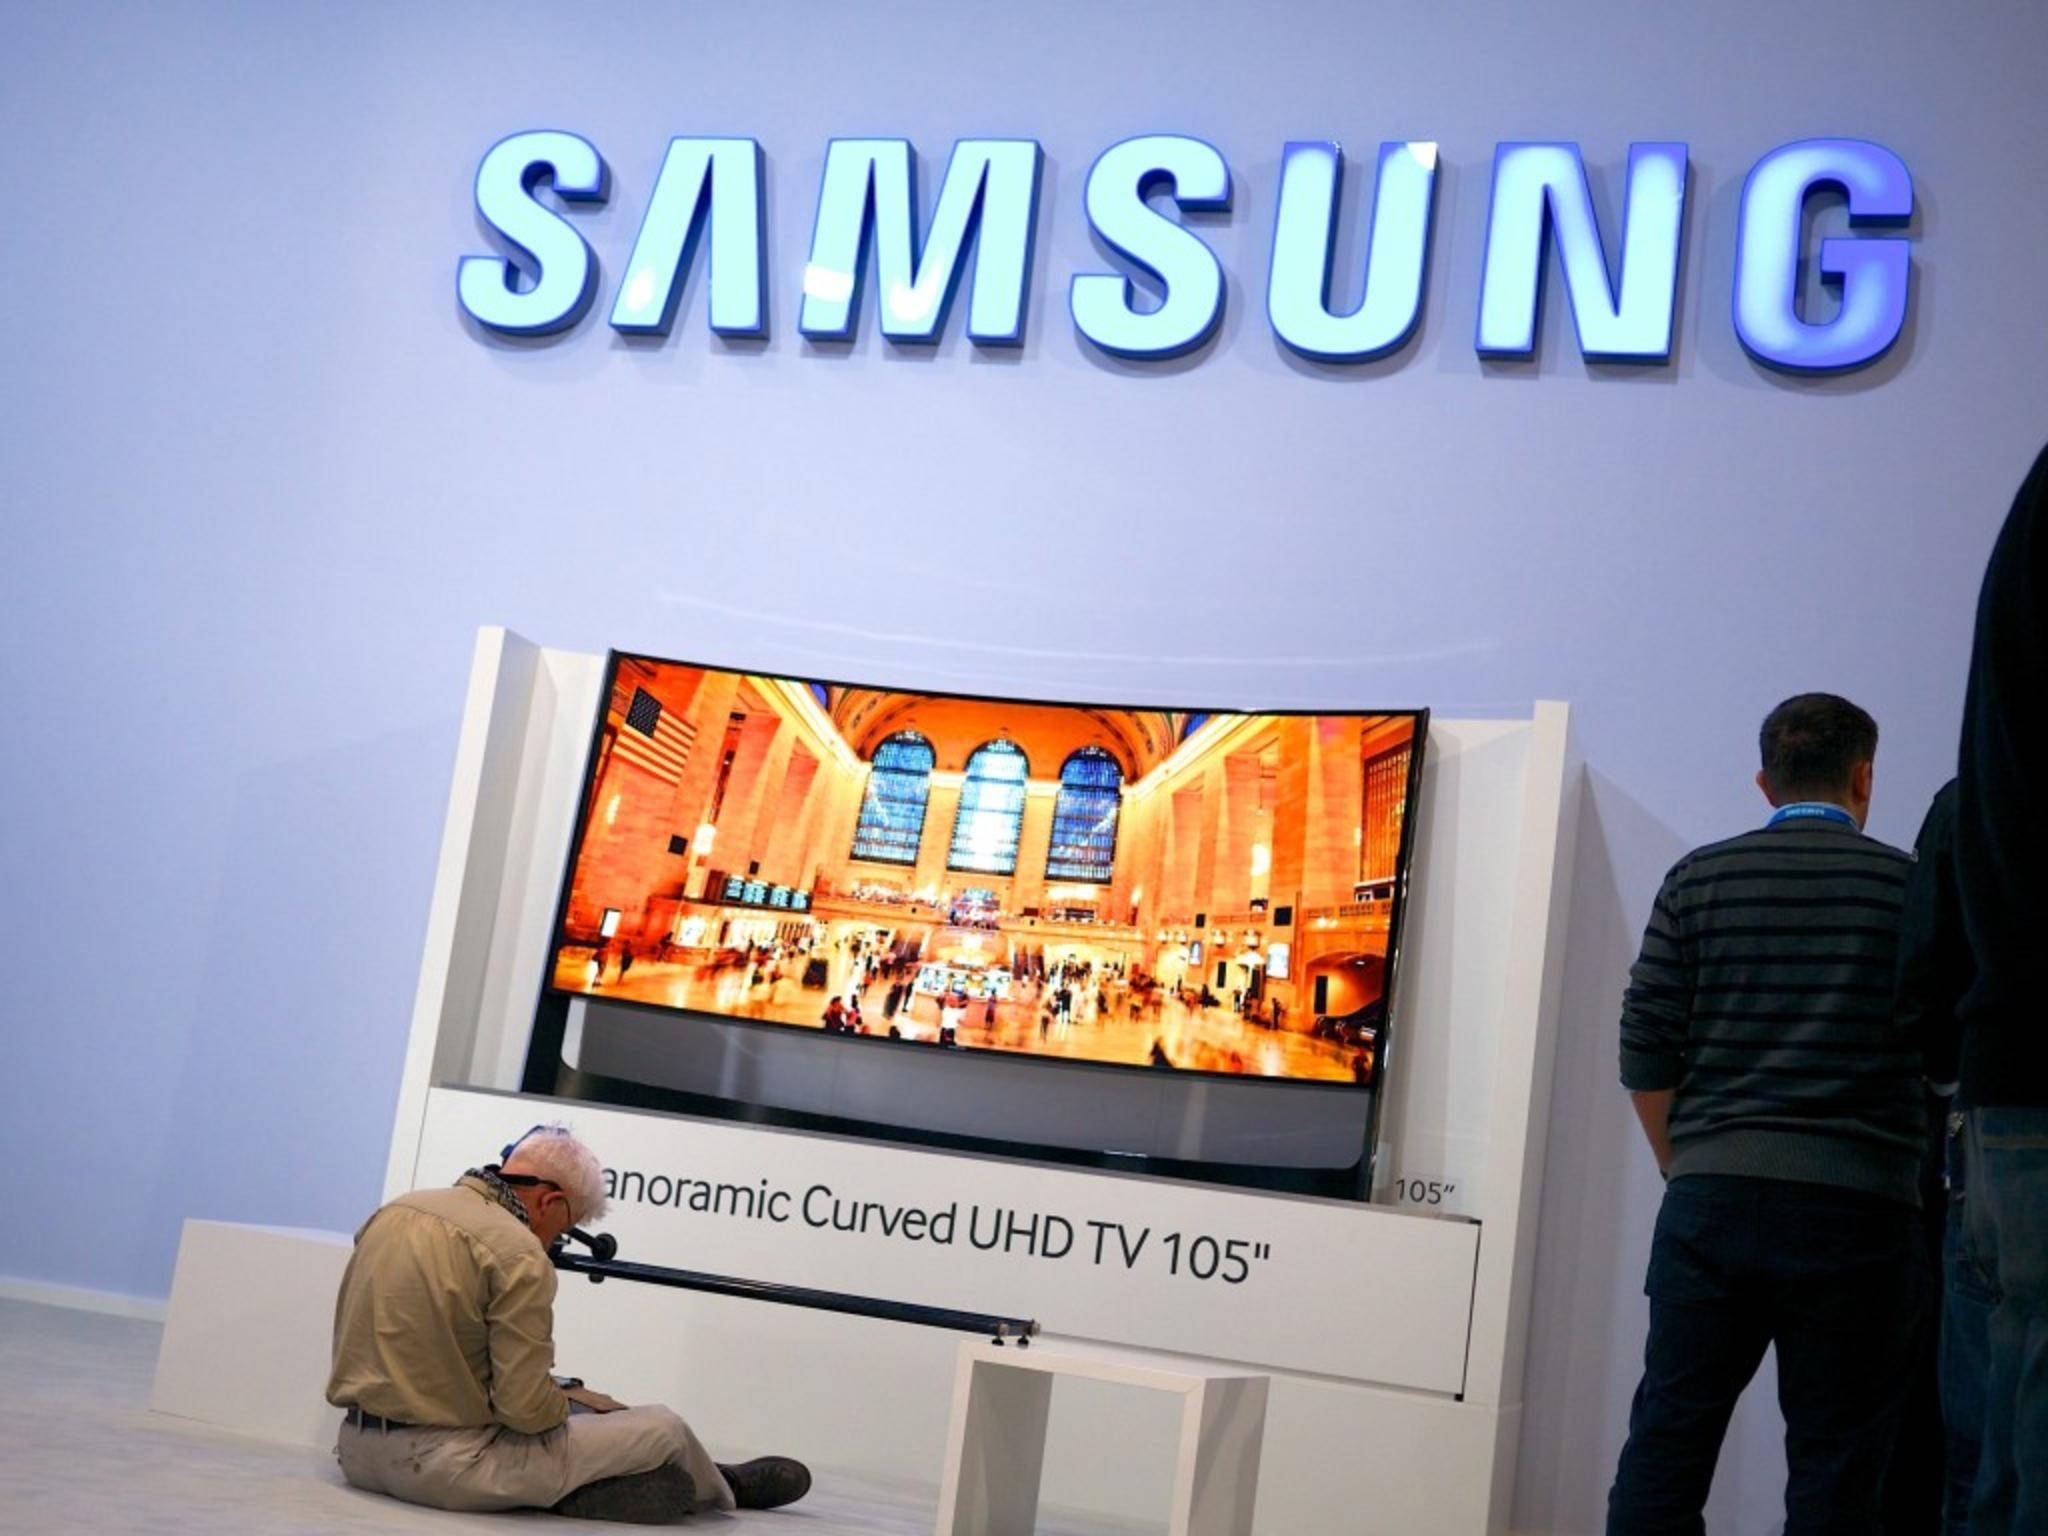 An Smart TVs können auch zusätzliche Tastaturen angeschlossen werden.